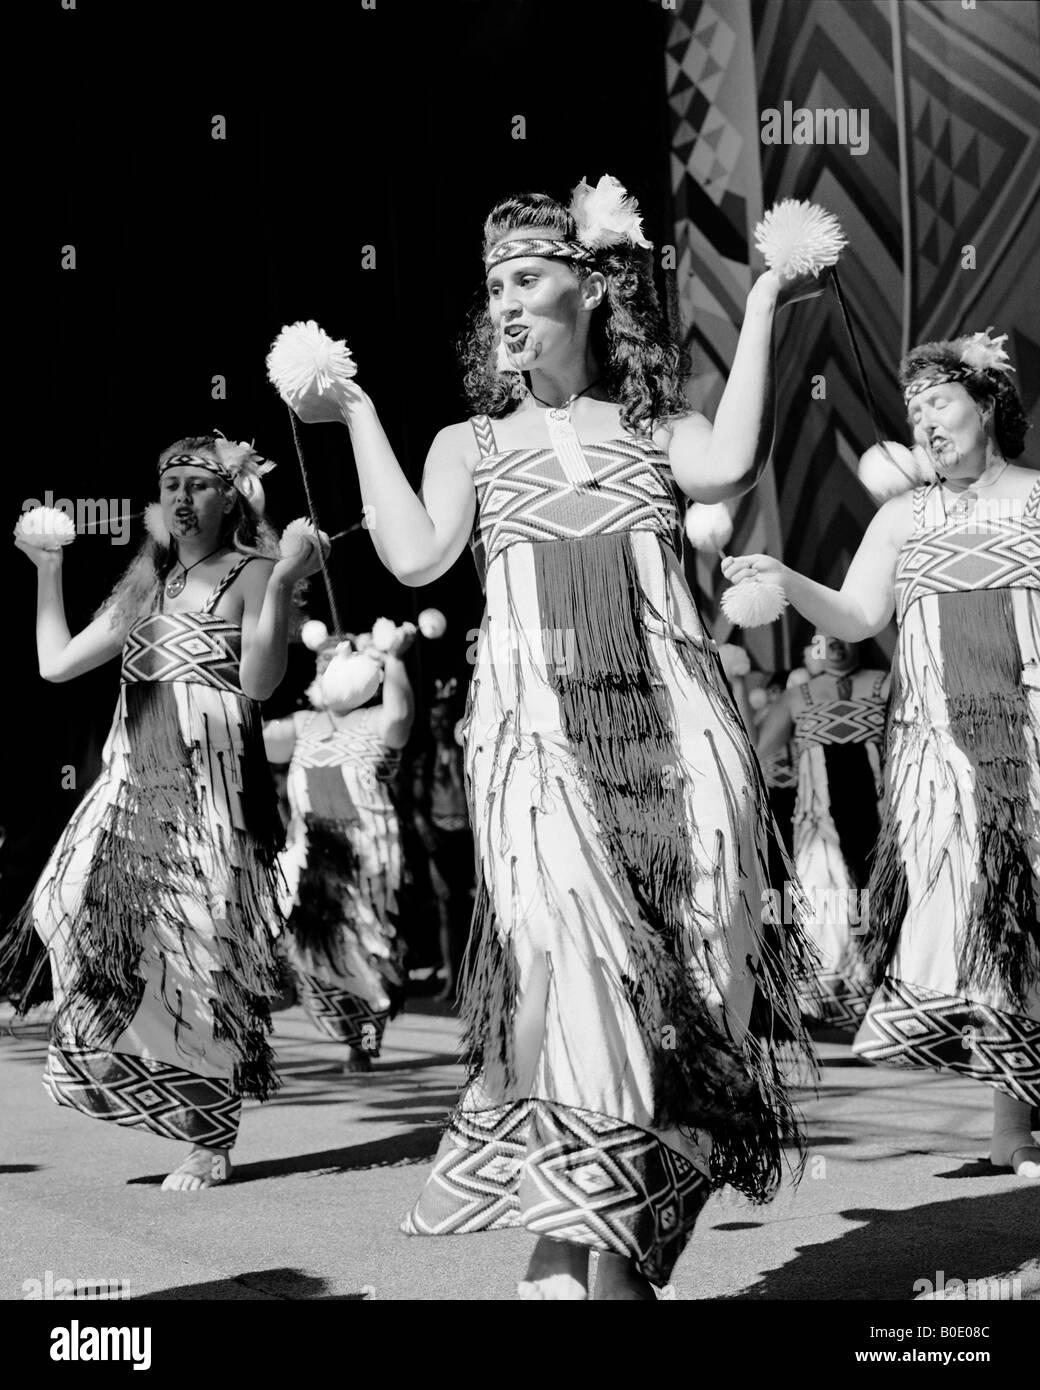 Maori poi performed by Nga Tai E Rua Upper Hutt New Zealand - Stock Image